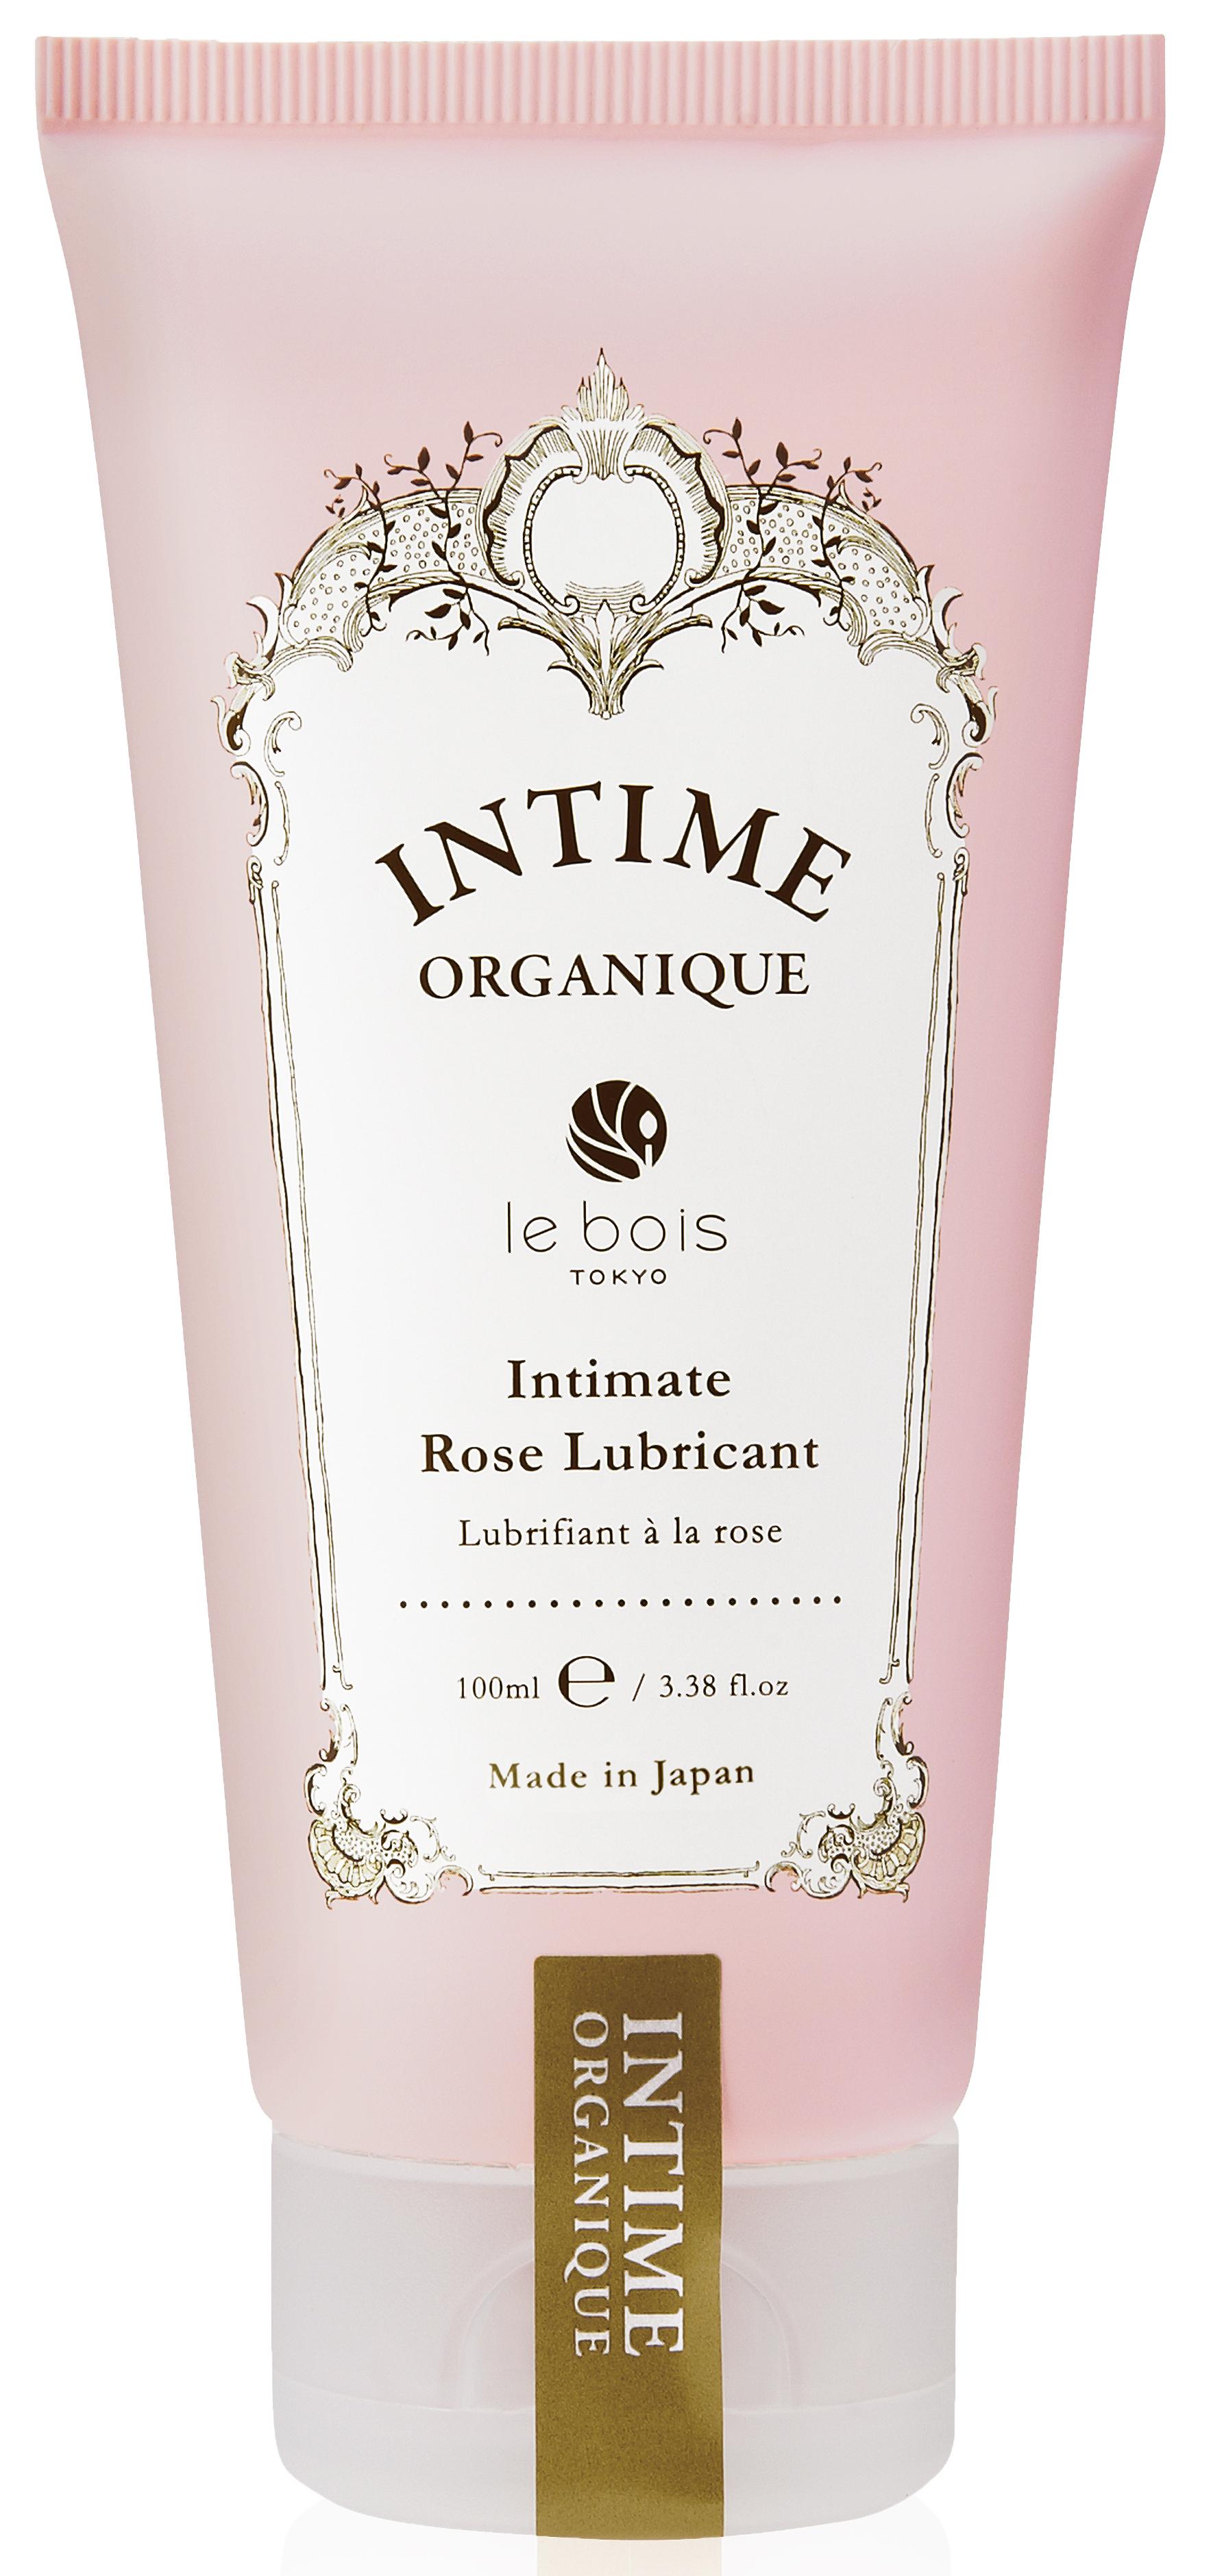 INTIME ORGANIQUE Уход-лубрикант органический увлажняющий / Intimate Rose Lubricant 100 мл - Лосьоны